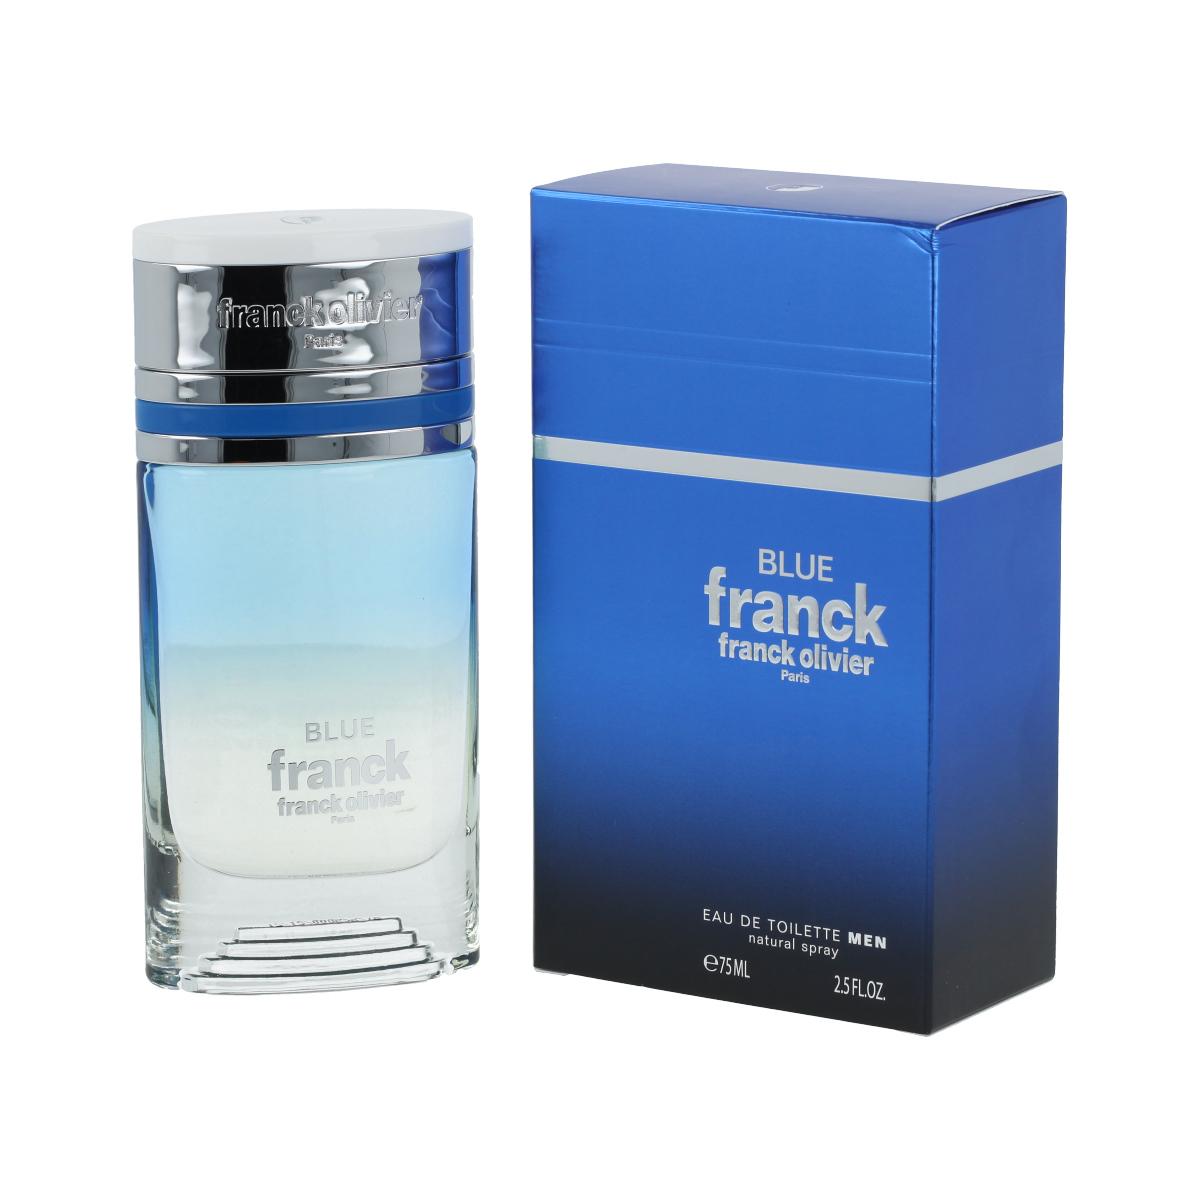 Franck Olivier Franck Blue Eau De Toilette 75 ml (man) 17395